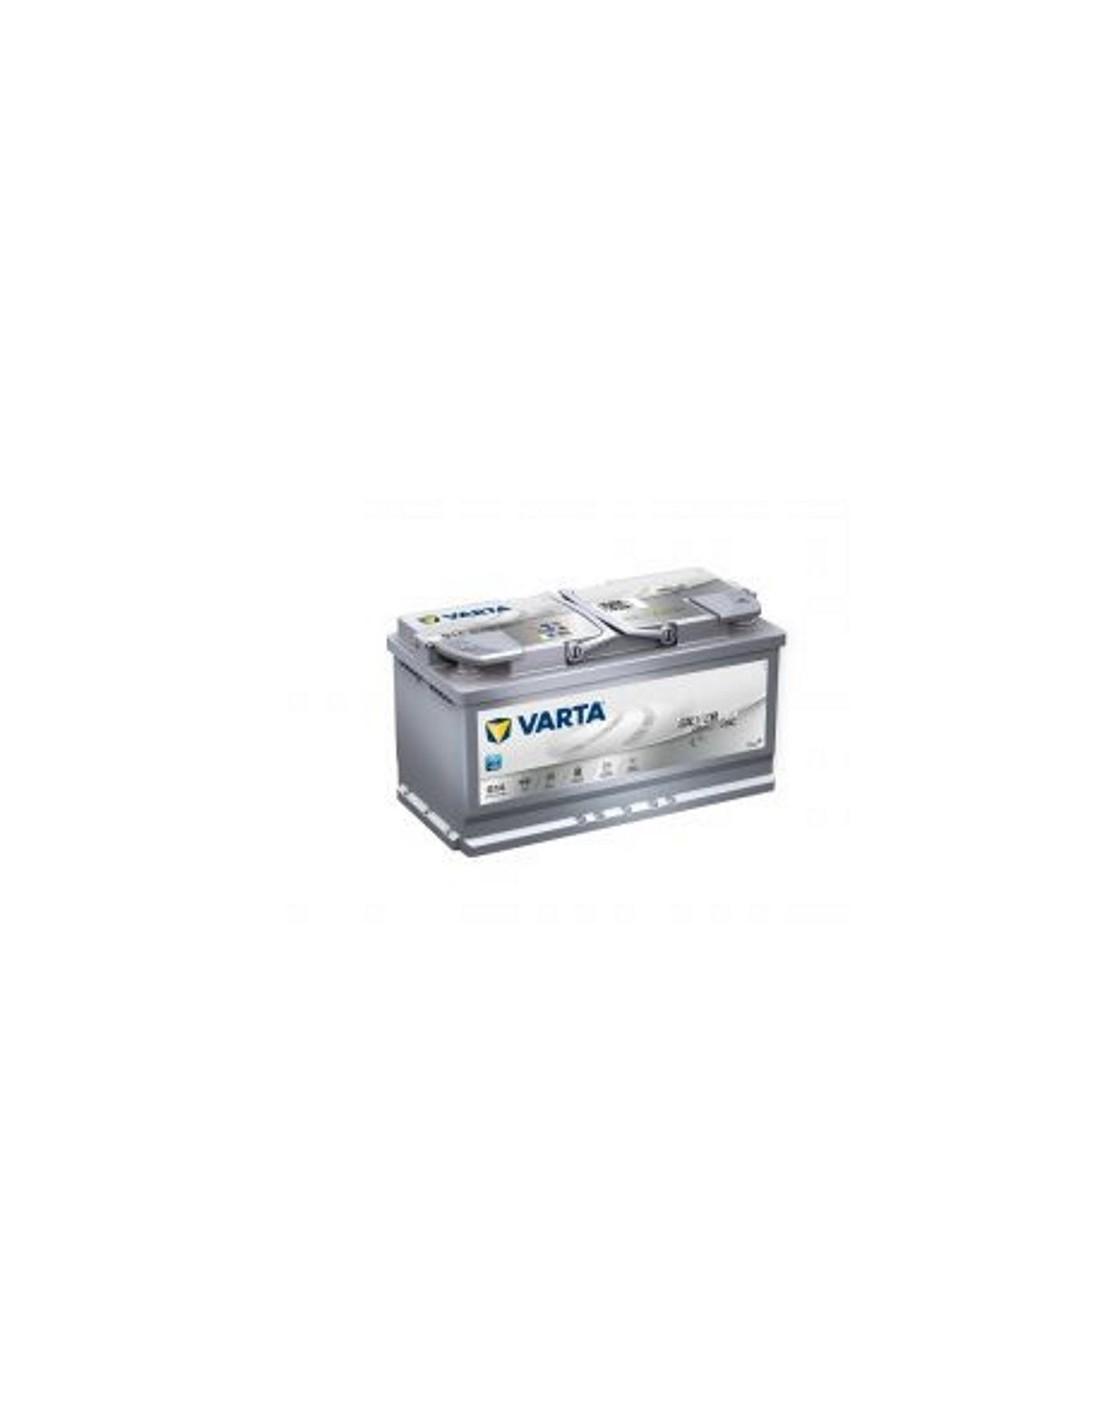 bater a varta silver dynamic agm 95 ah 239 48 www. Black Bedroom Furniture Sets. Home Design Ideas